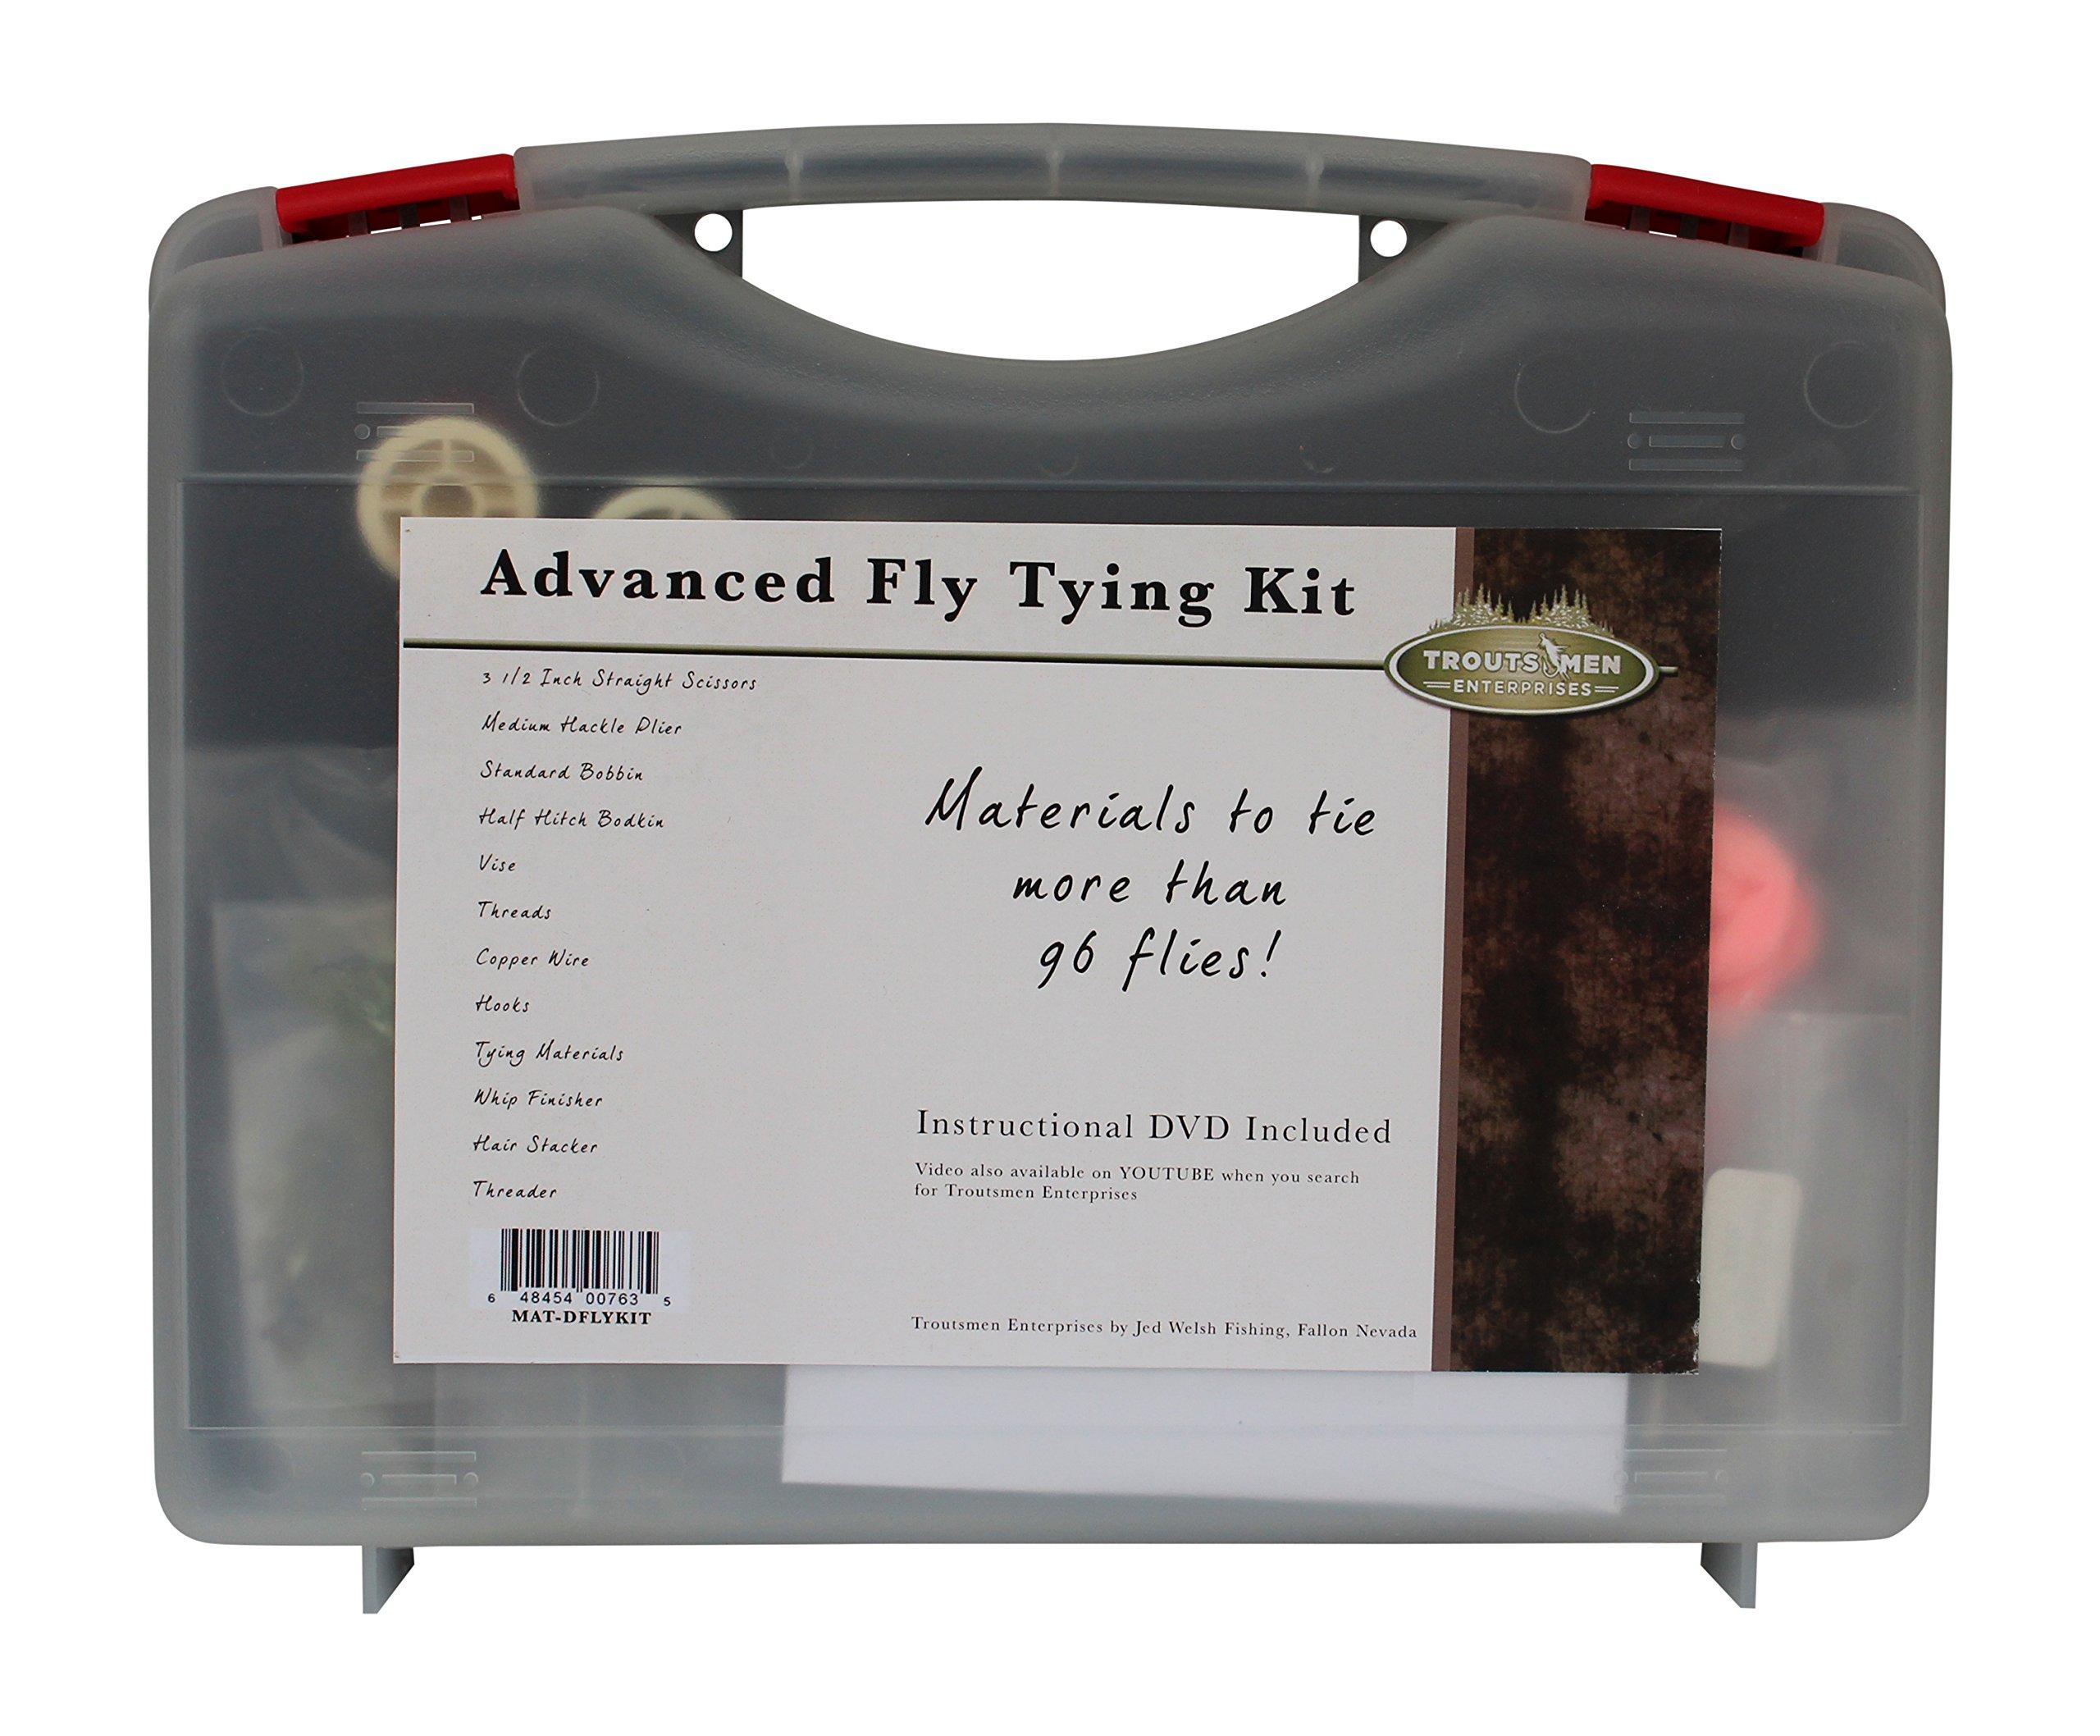 Jed welsh fishing advanced fly tying kit ebay for Fly fishing tying kit